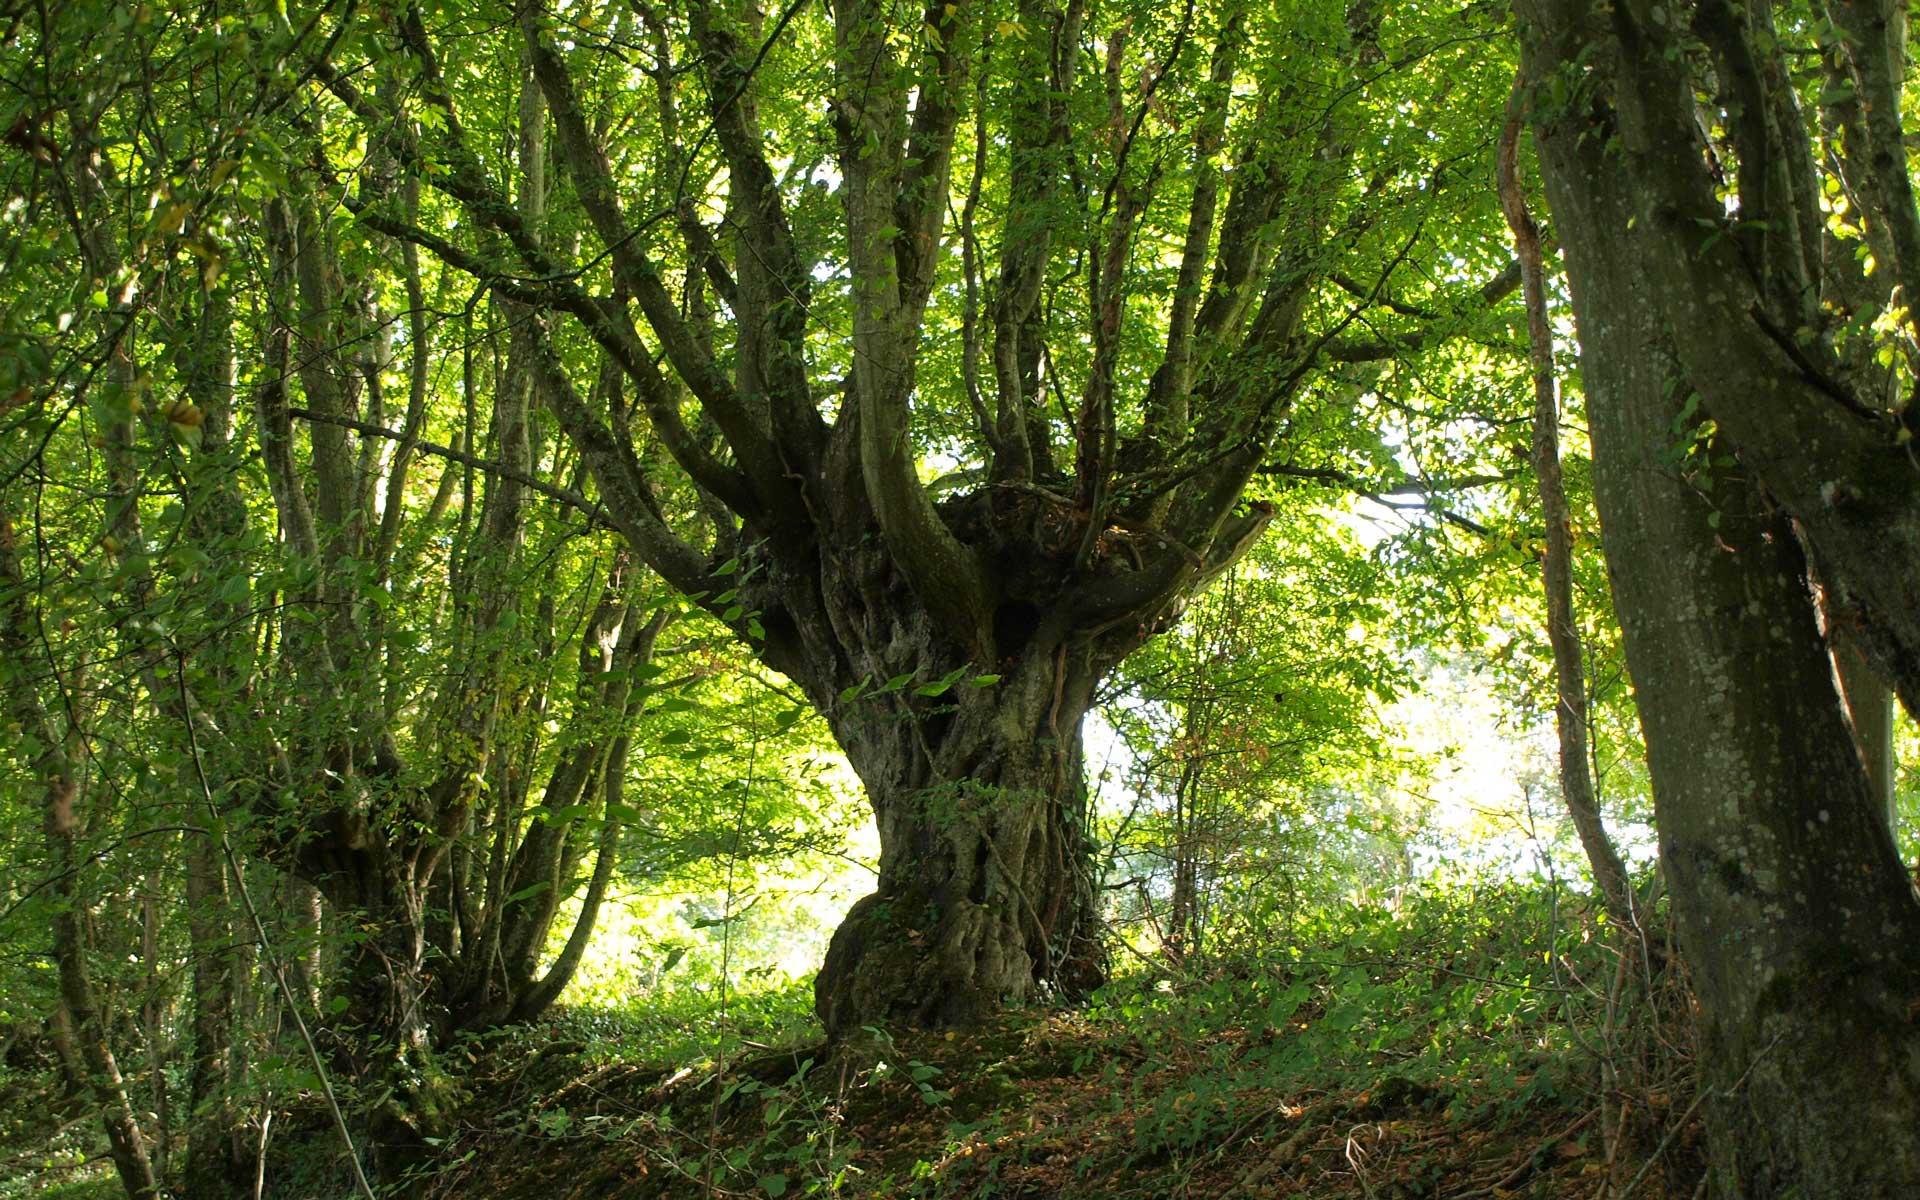 Balade biodiversité - Ecobalade - Crédit Ot Vendome